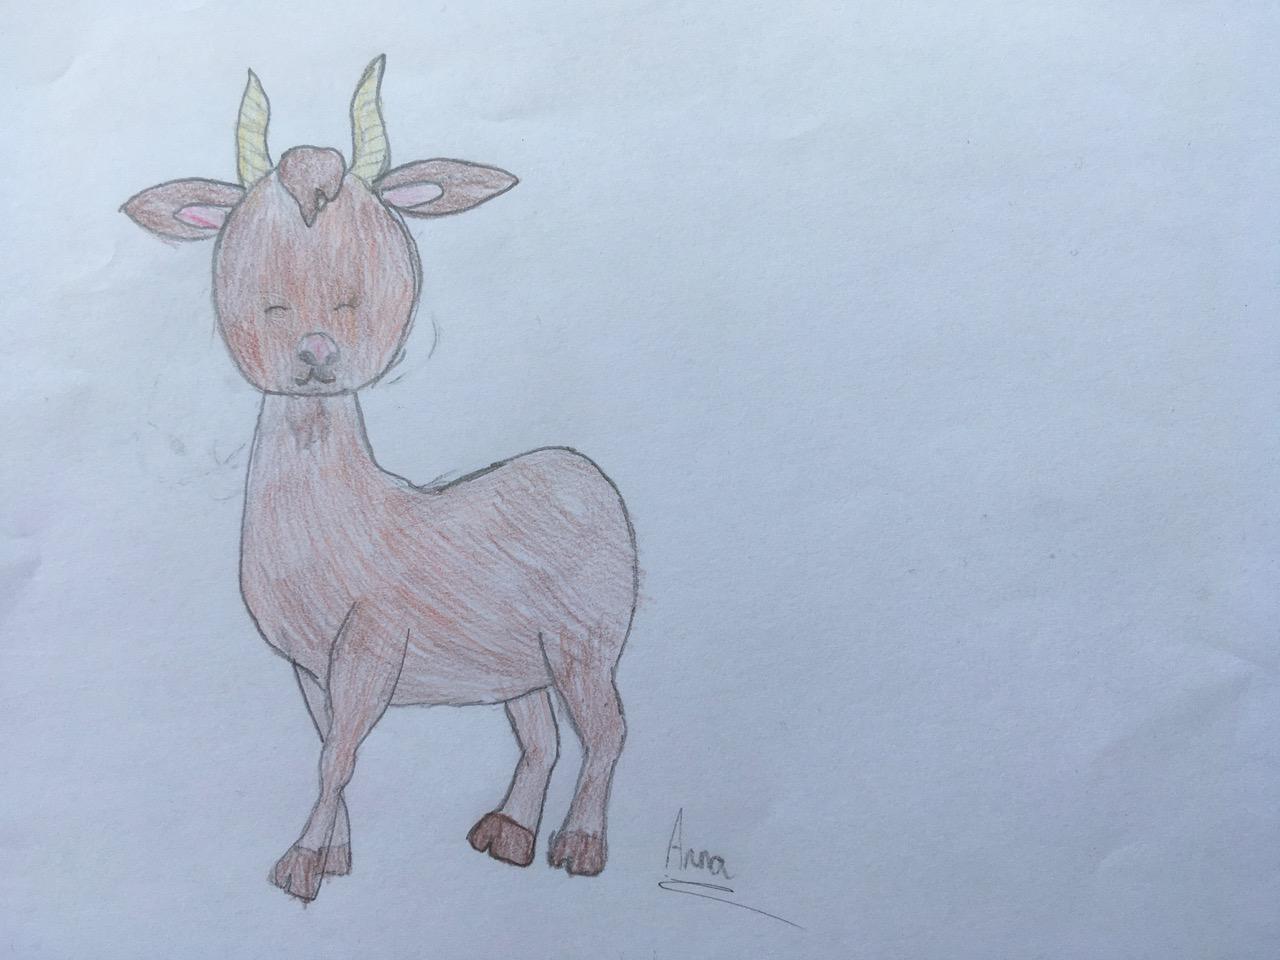 Anna Diffley, Age 10